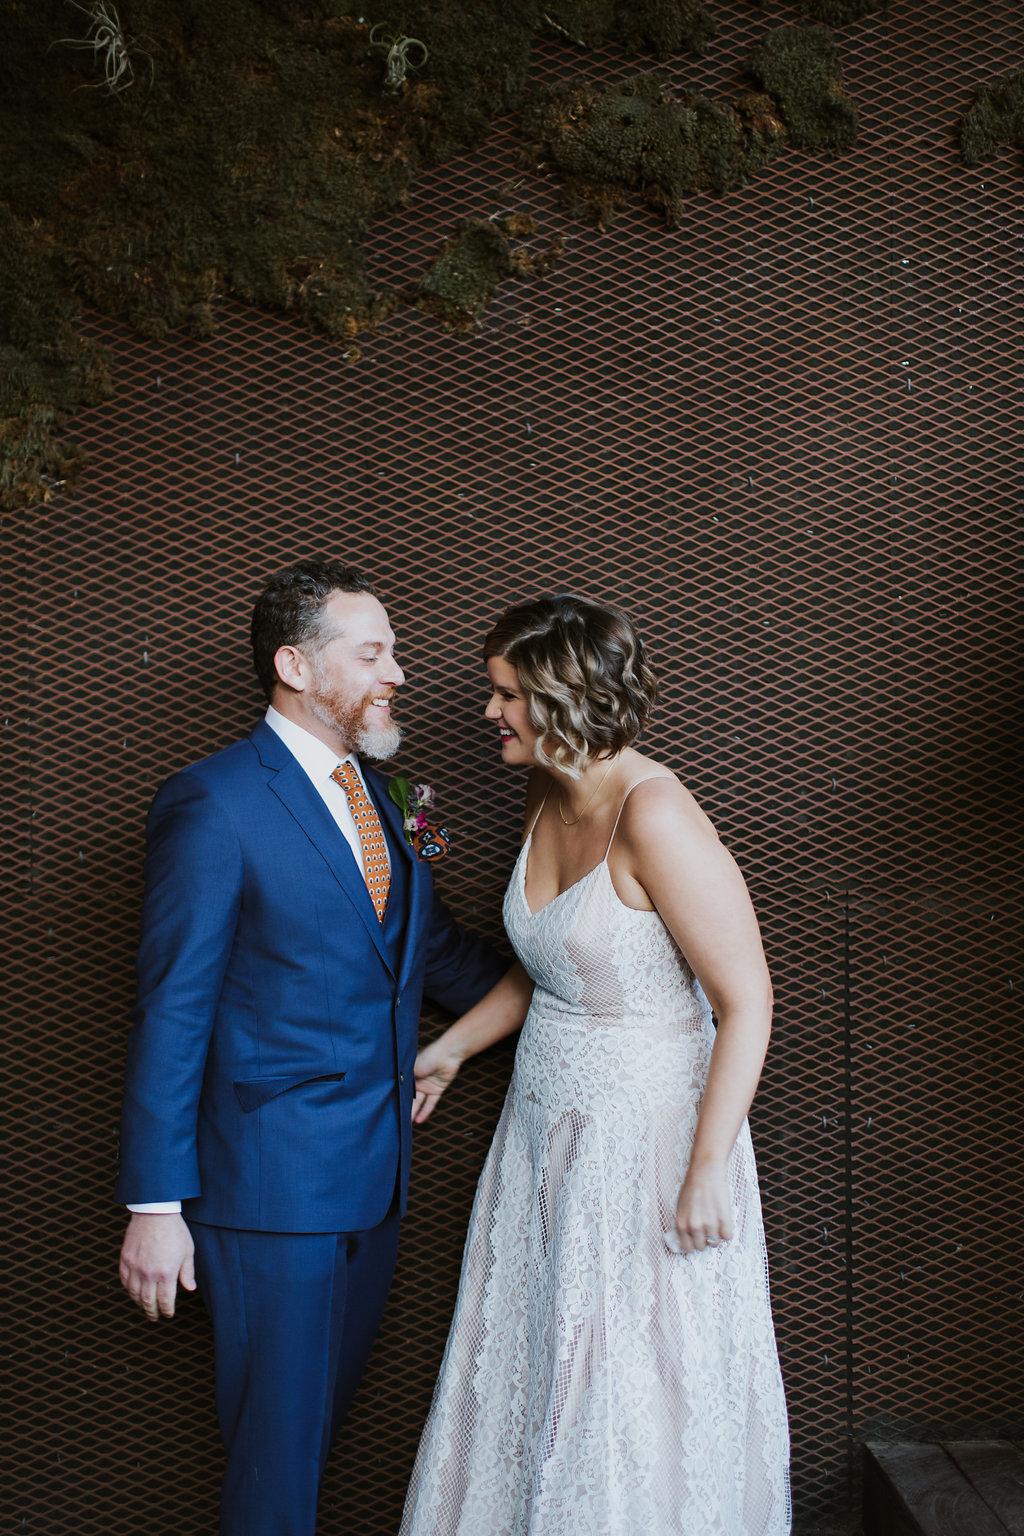 Paige-Newton-Intimate-Wedding-Photographer-Malverde-Wedding-Photography0056.jpg